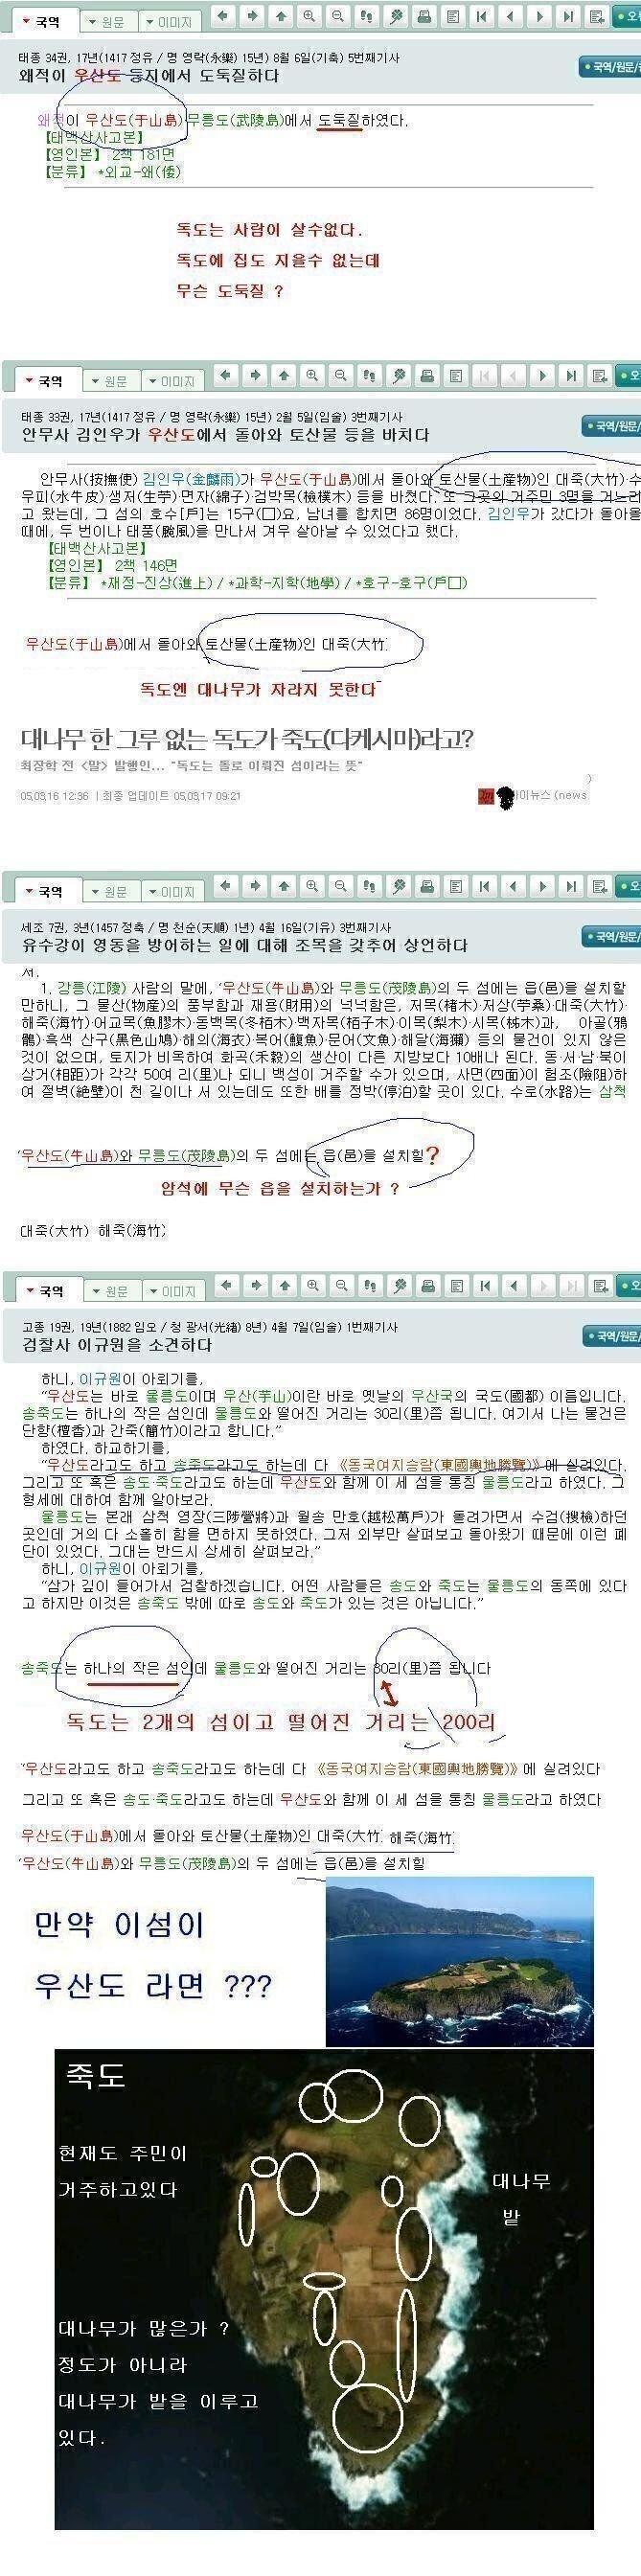 viewimage.php?id=25b8dc2aeedd2aa36f&no=24b0d769e1d32ca73ceb86fa11d02831eebc6c37c2fa034916fac403212605e232f5d7a914f2d63e0215e5c1b5c19ffff77d7eda1faba95e98b281ba9380e2b06d0083080555eeb9978cc4b9c1